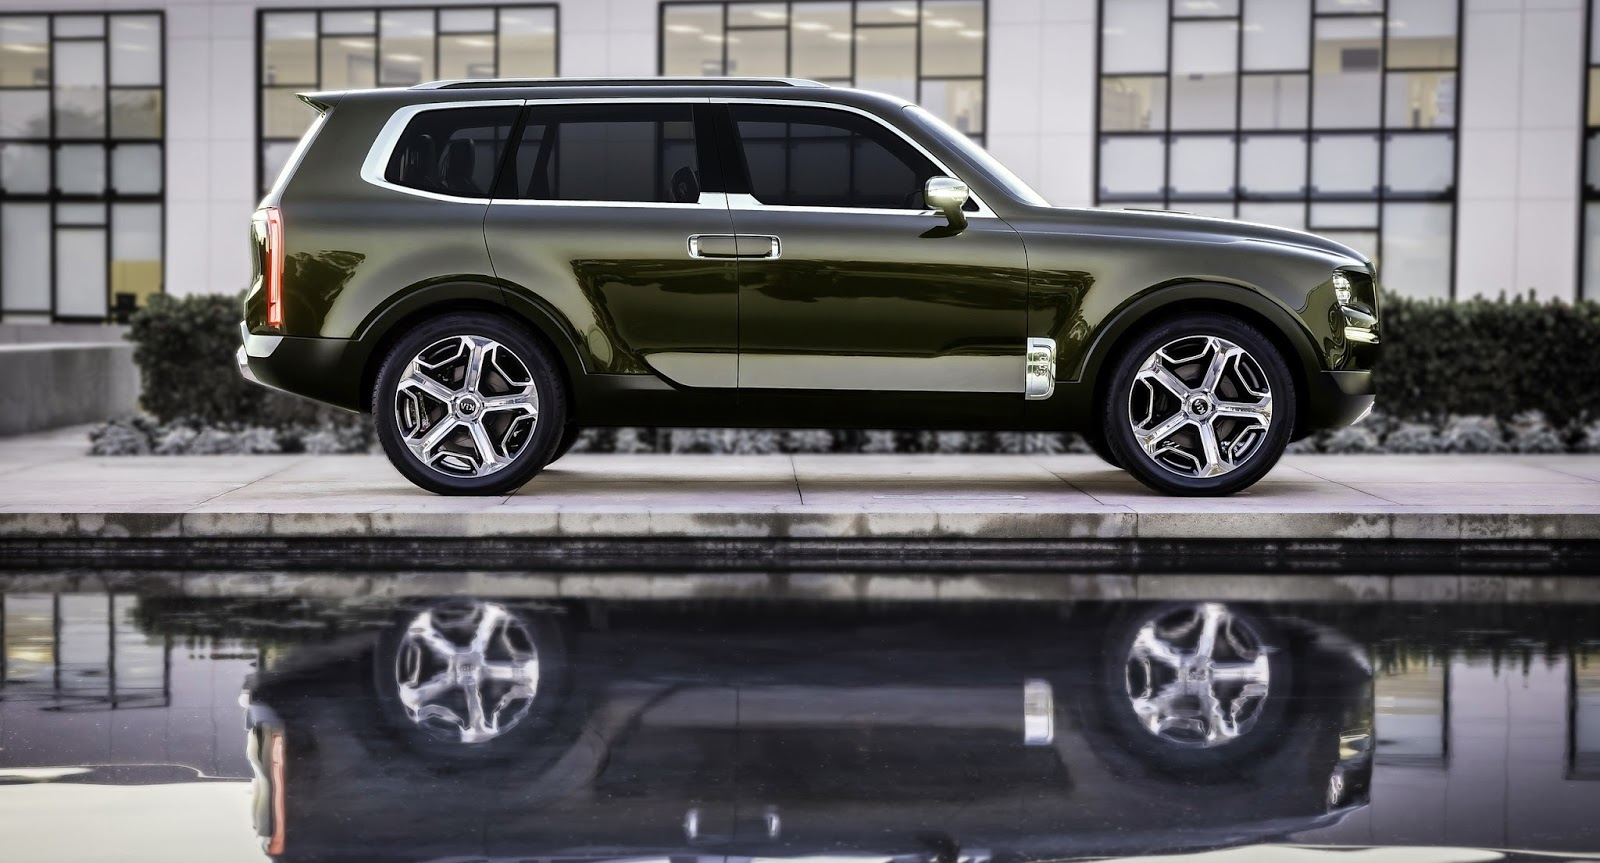 autokavla: 2016 Kia Telluride SUV Concept